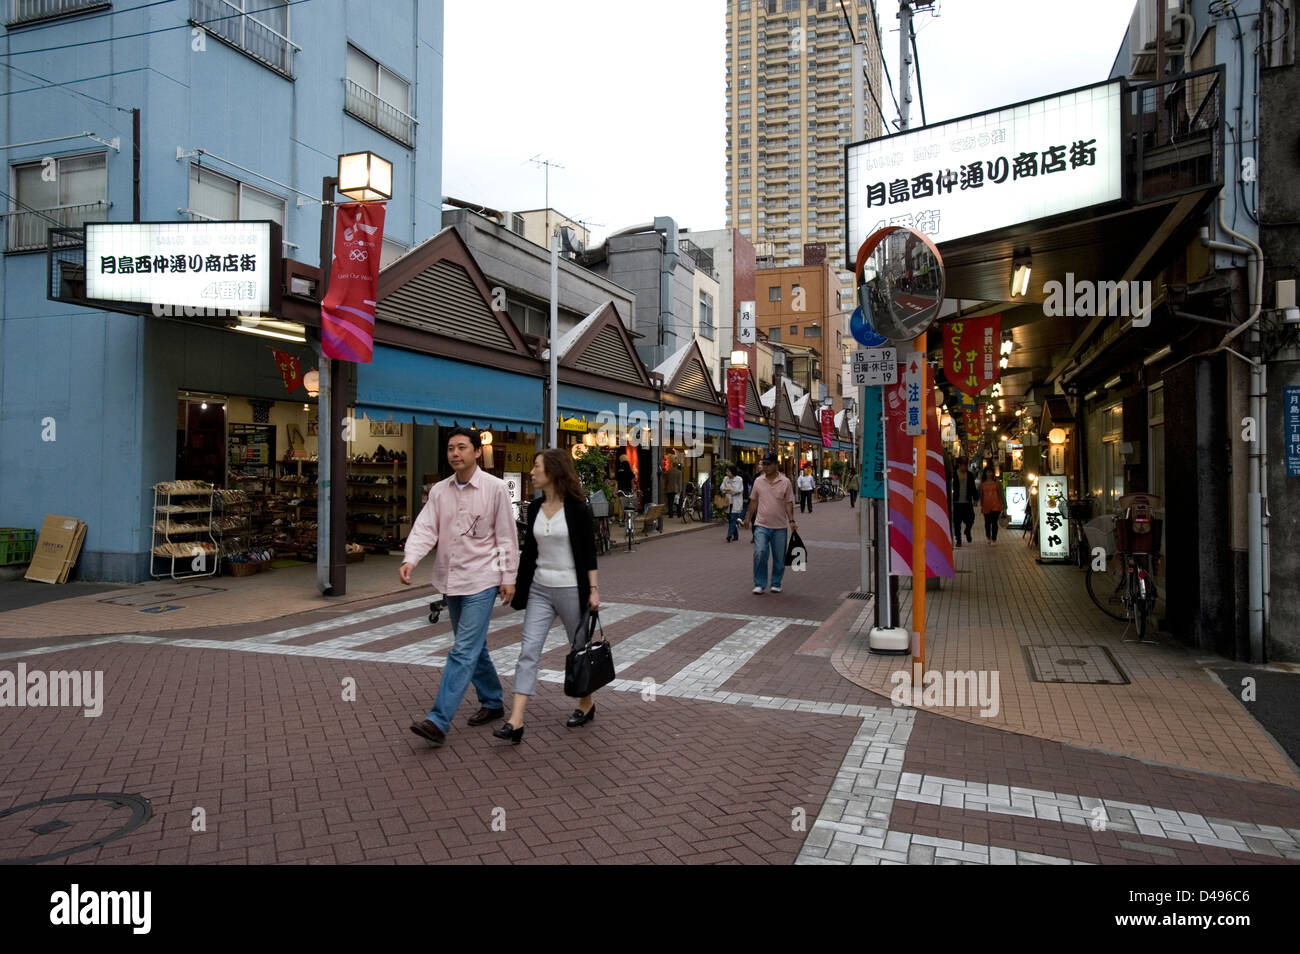 Street running through a manjayaki restaurant district, where one can enjoy Japanese okonomiyaki pizza, Tsukishima, - Stock Image